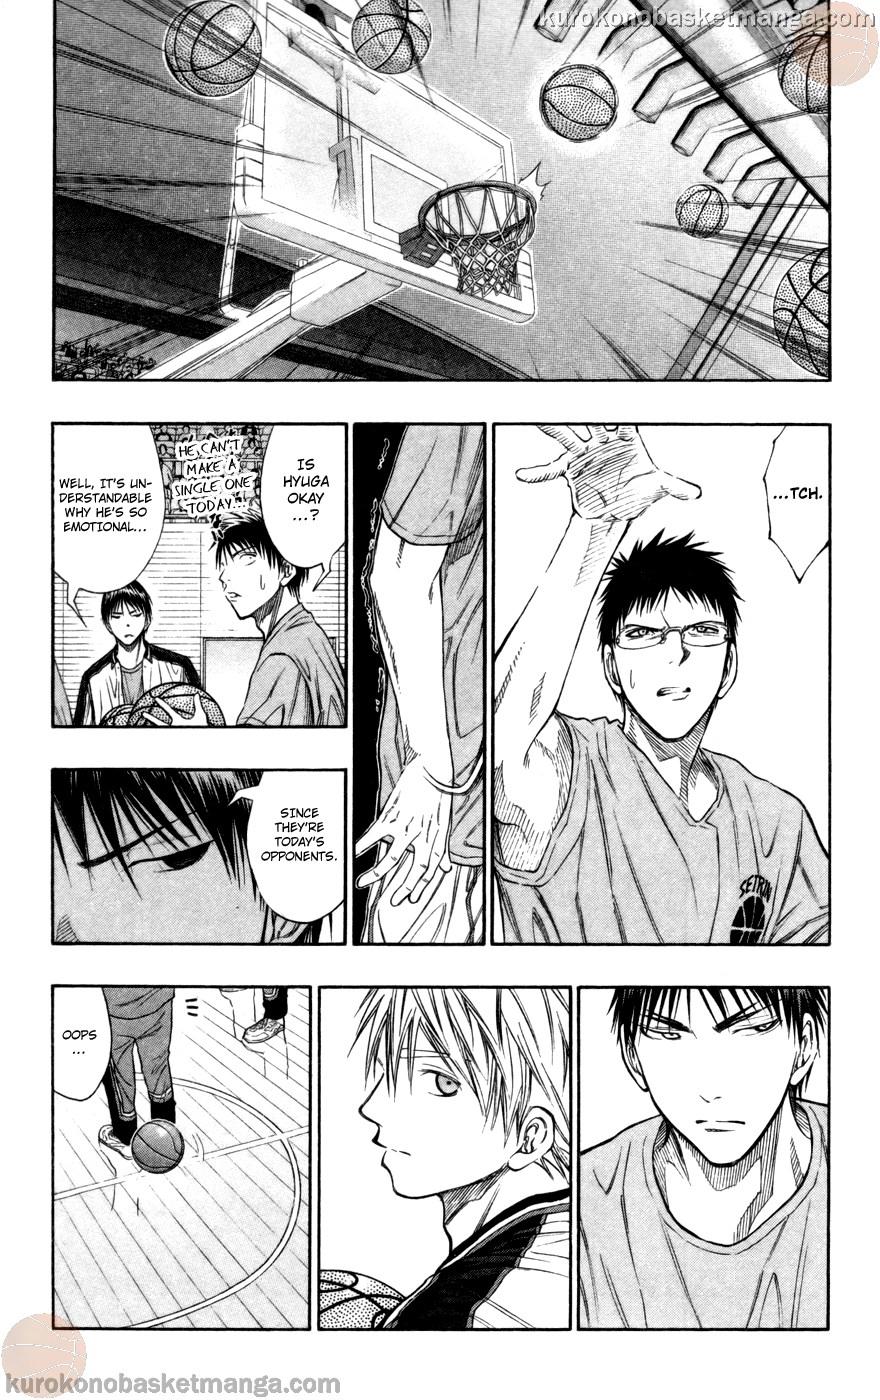 Kuroko no Basket Manga Chapter 100 - Image 11